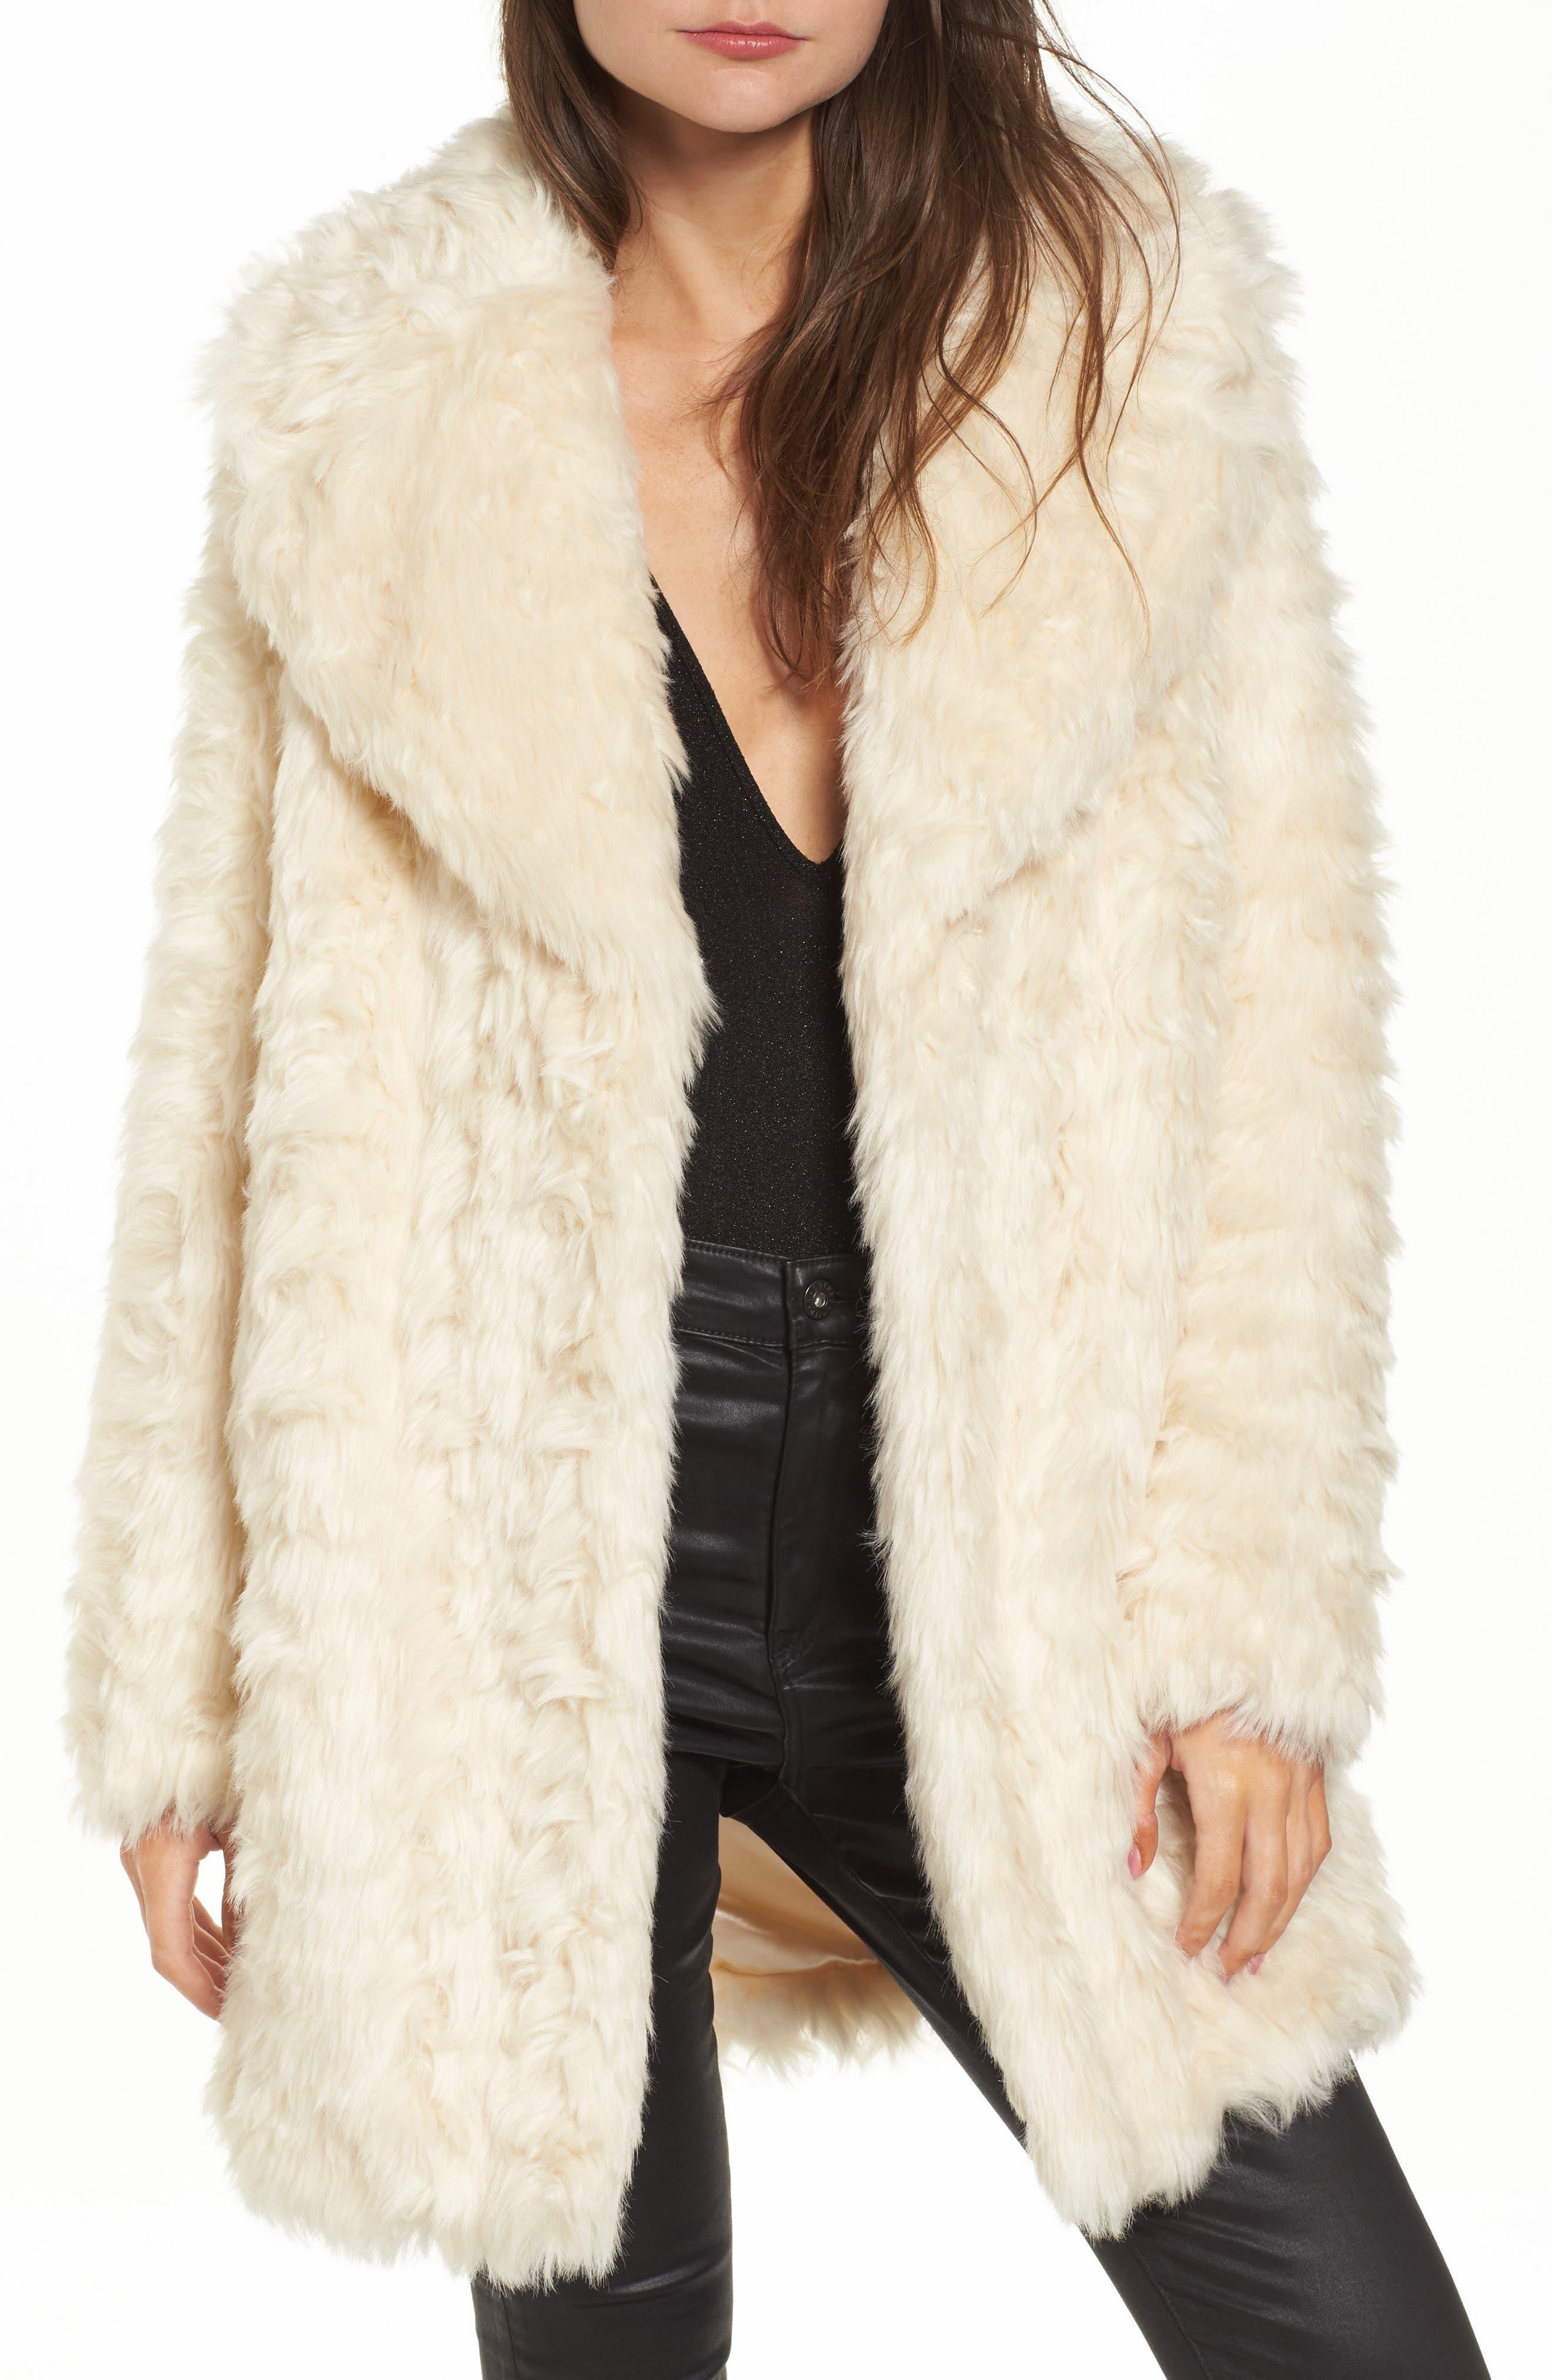 Curly Faux Fur Coat,                             Main thumbnail 1, color,                             Ivory